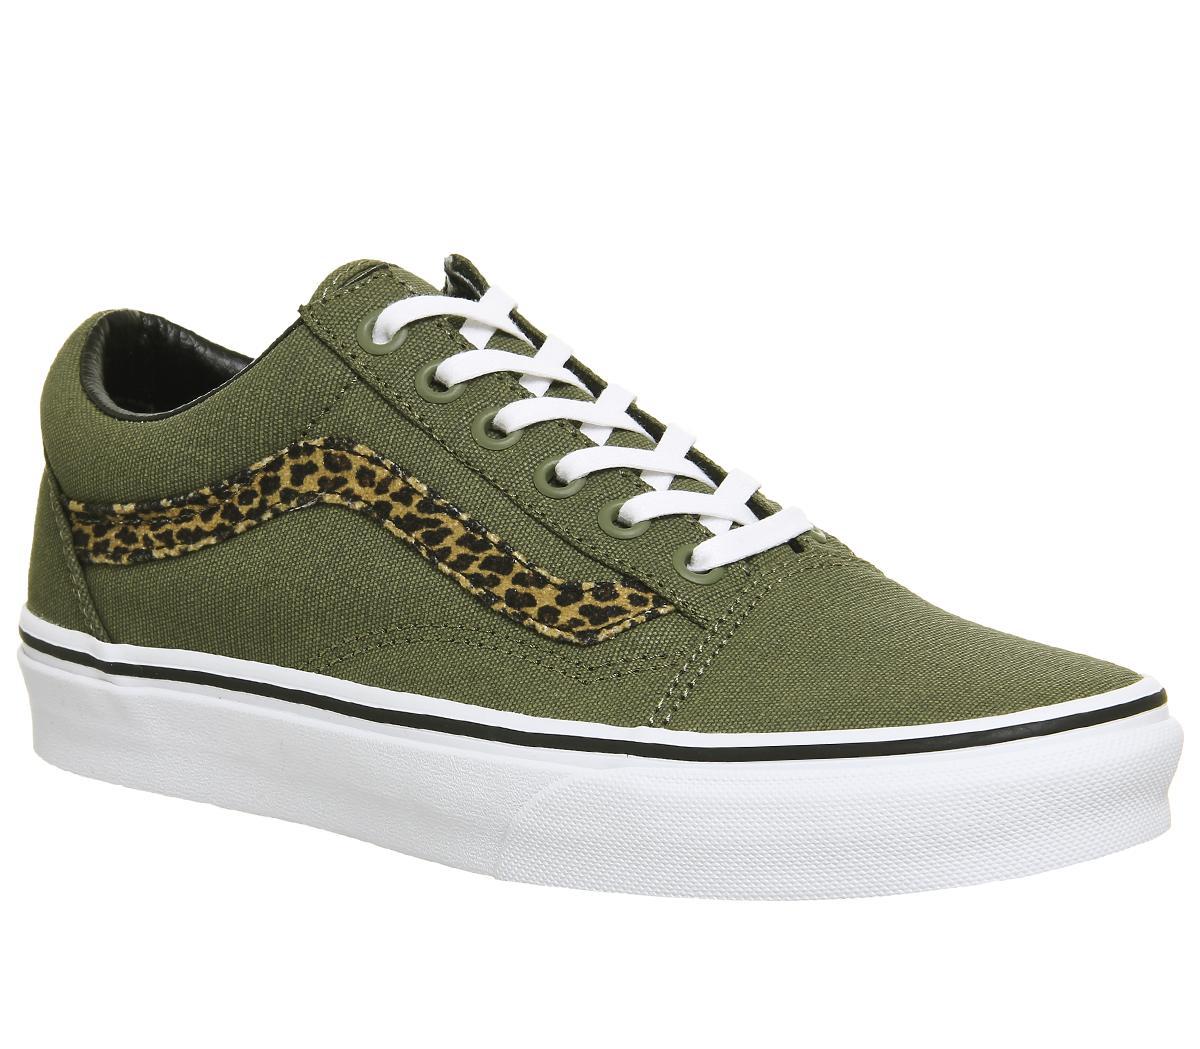 Vans Old Skool Trainers Mini Leopard